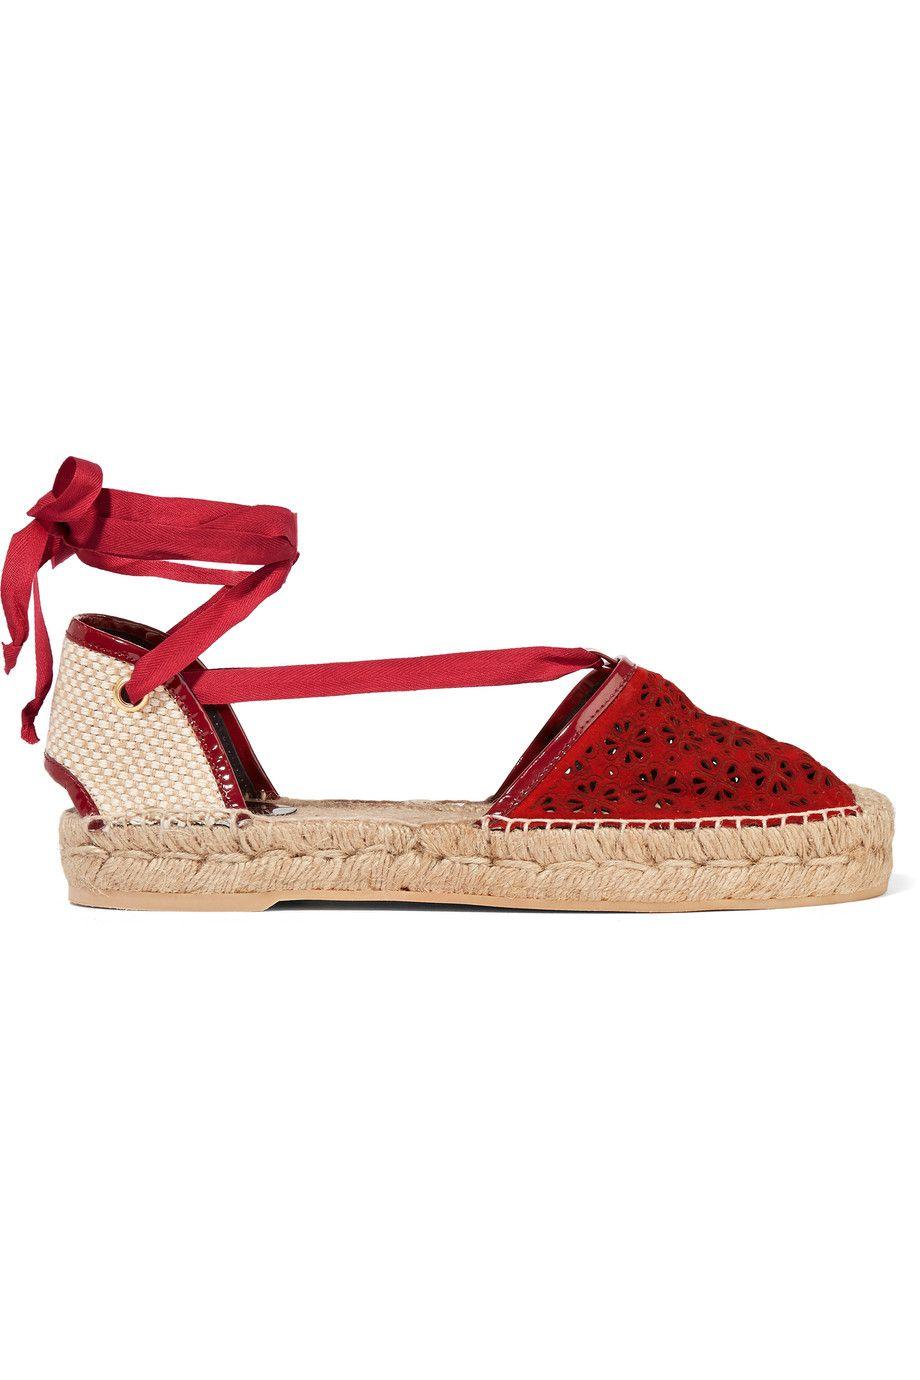 0e6c36a95 OSCAR DE LA RENTA Adriana Laser-Cut Suede Espadrilles. #oscardelarenta  #shoes #flats